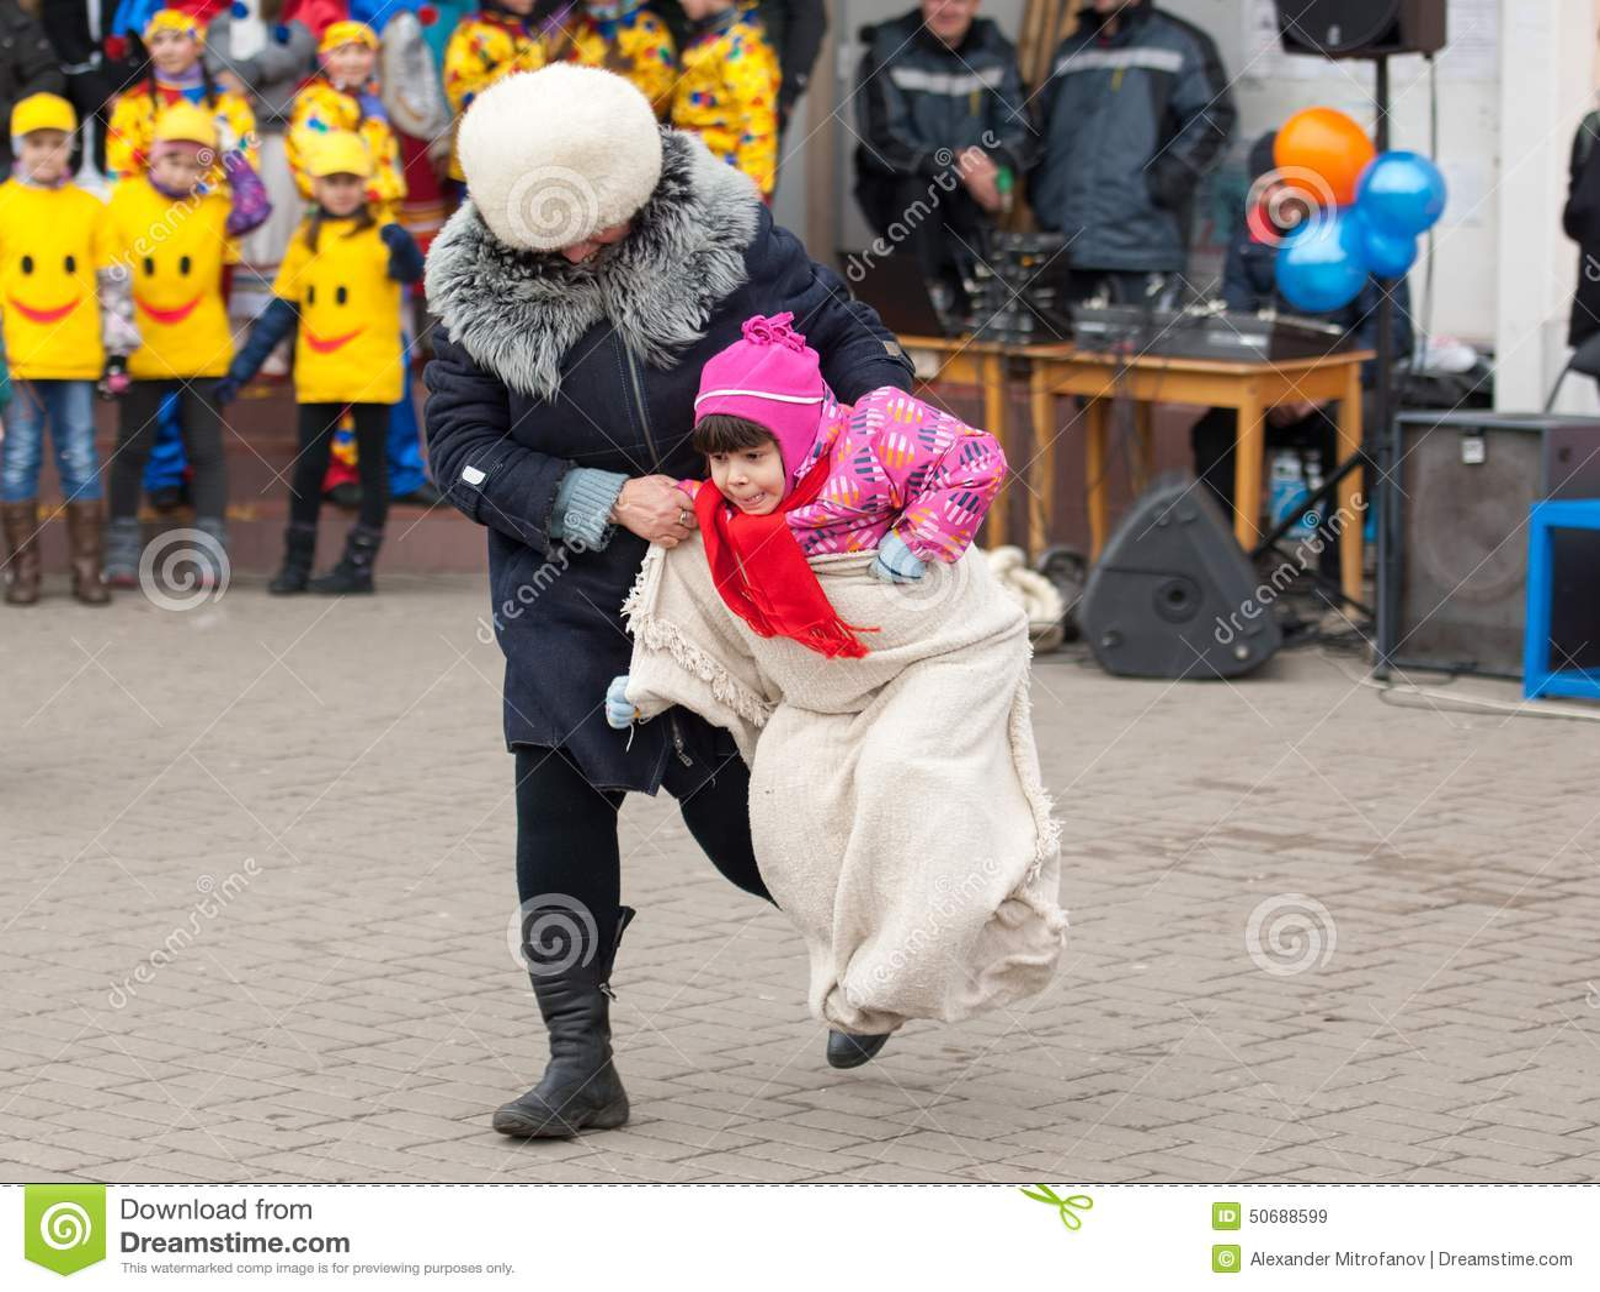 Download 跳跃在大袋 编辑类库存图片. 图片 包括有 人群, 玩偶, 外套, 森林, 舞蹈, 烙饼, 种族, 诱饵 - 50688599